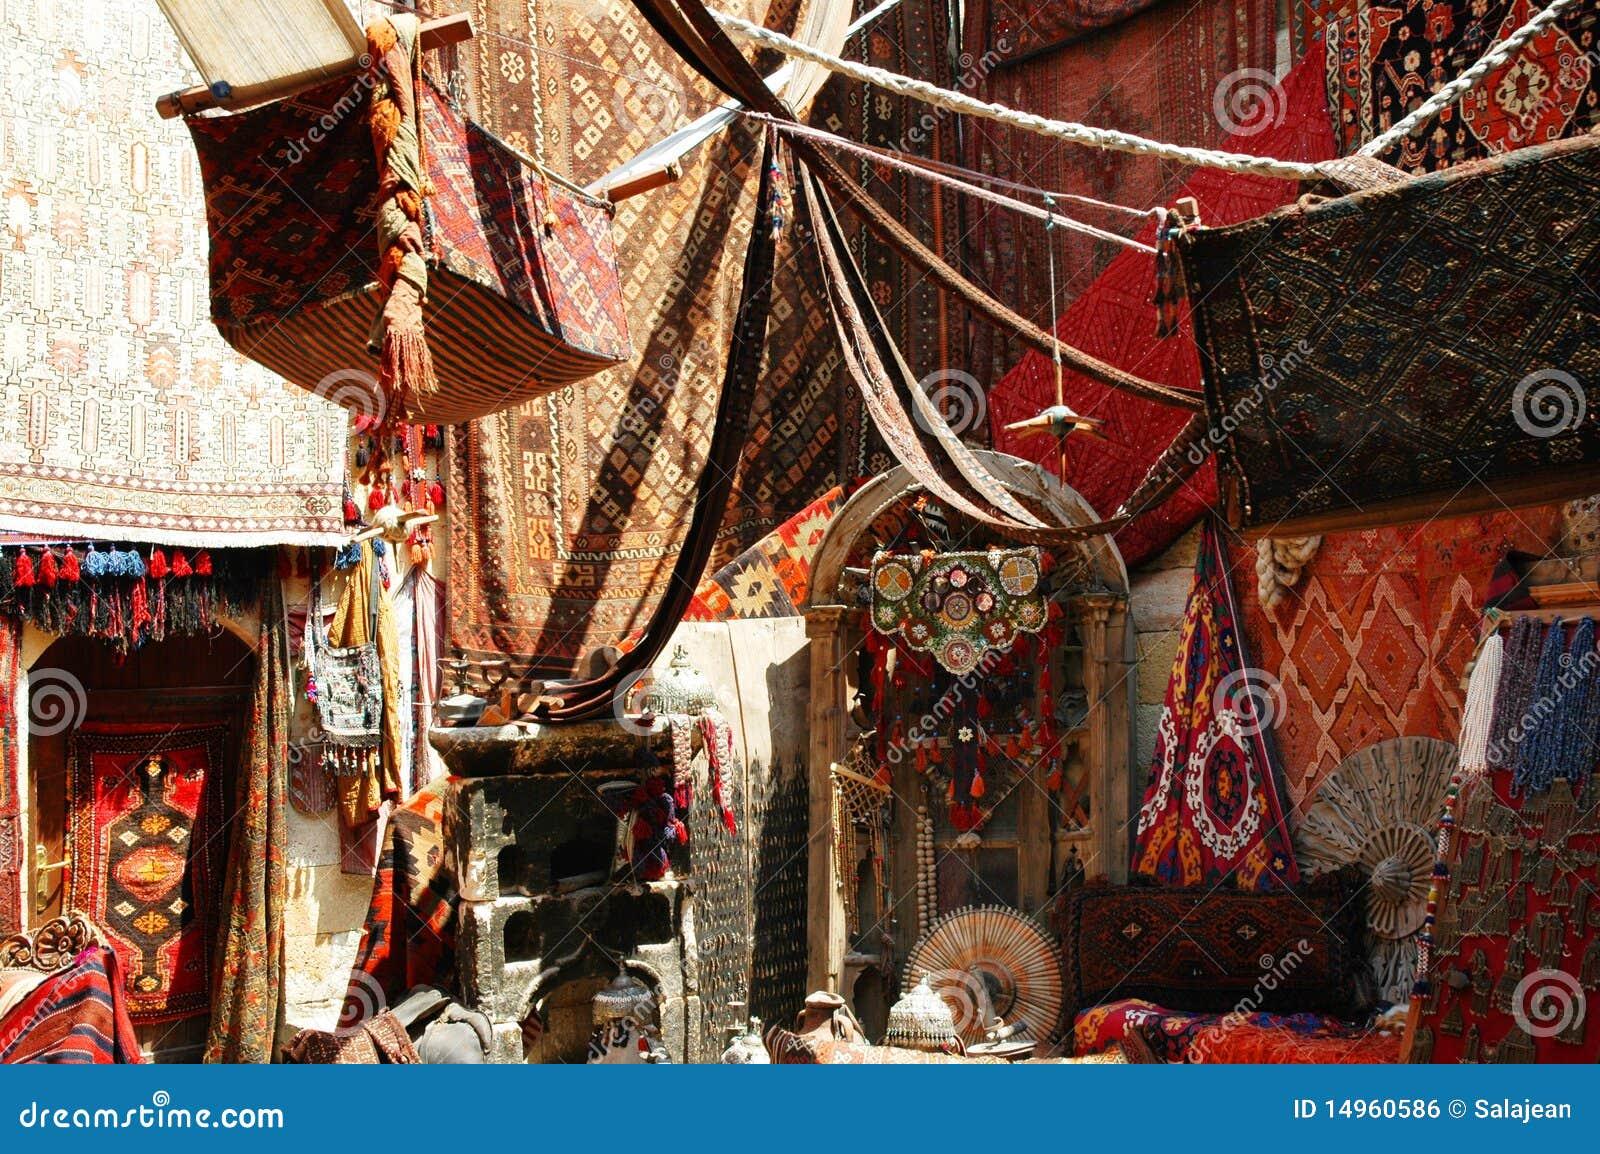 Turkish Carpet Store Bazaar Royalty Free Stock Image